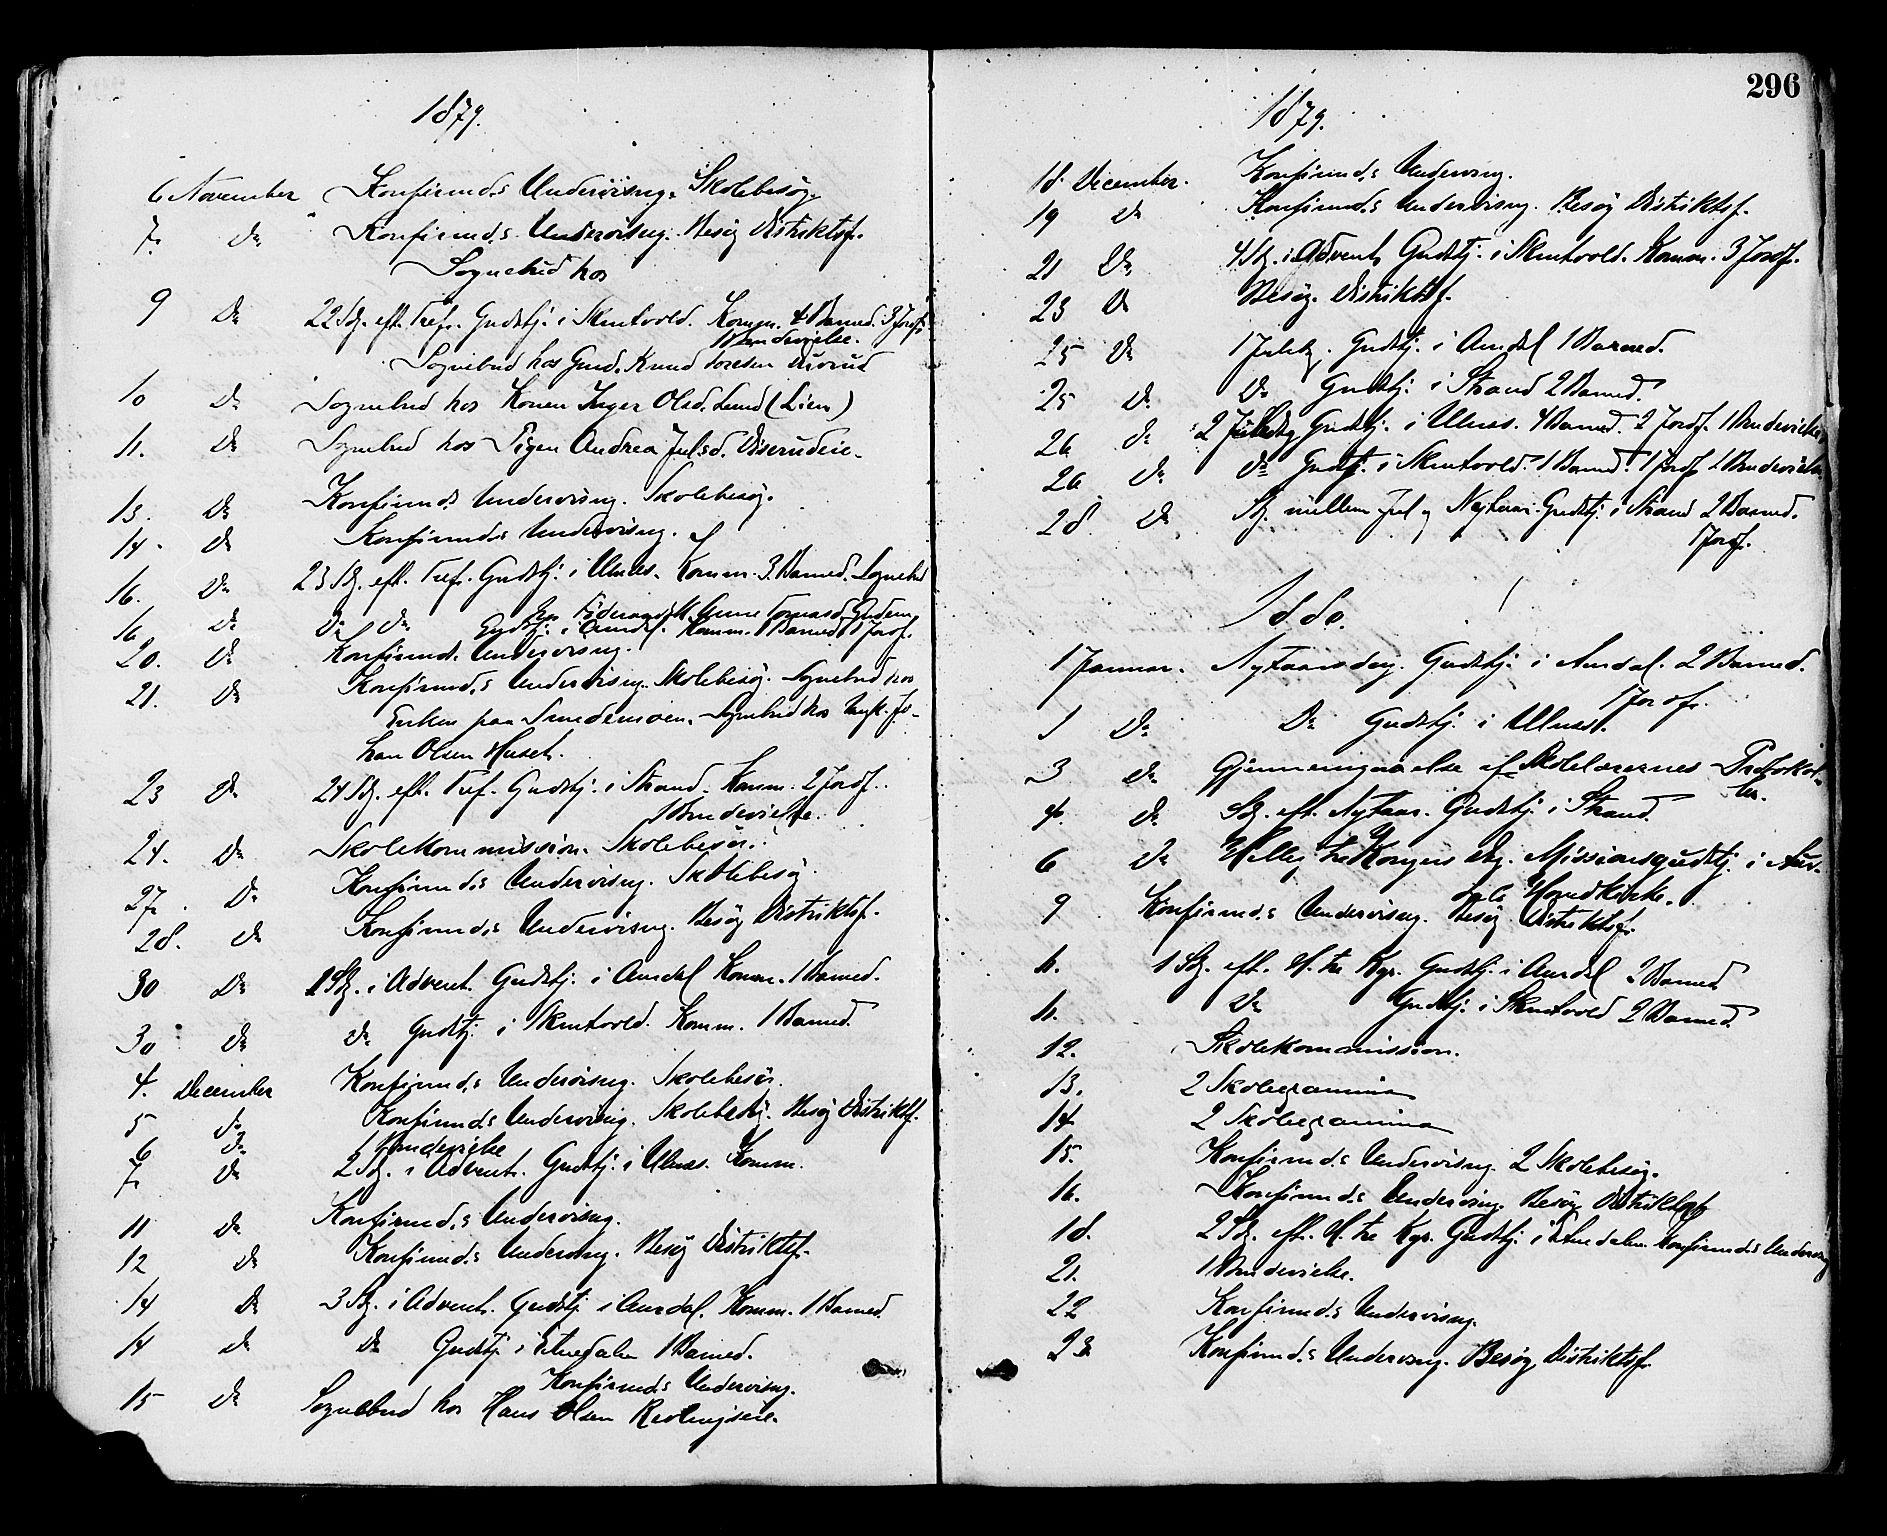 SAH, Nord-Aurdal prestekontor, Ministerialbok nr. 9, 1876-1882, s. 296